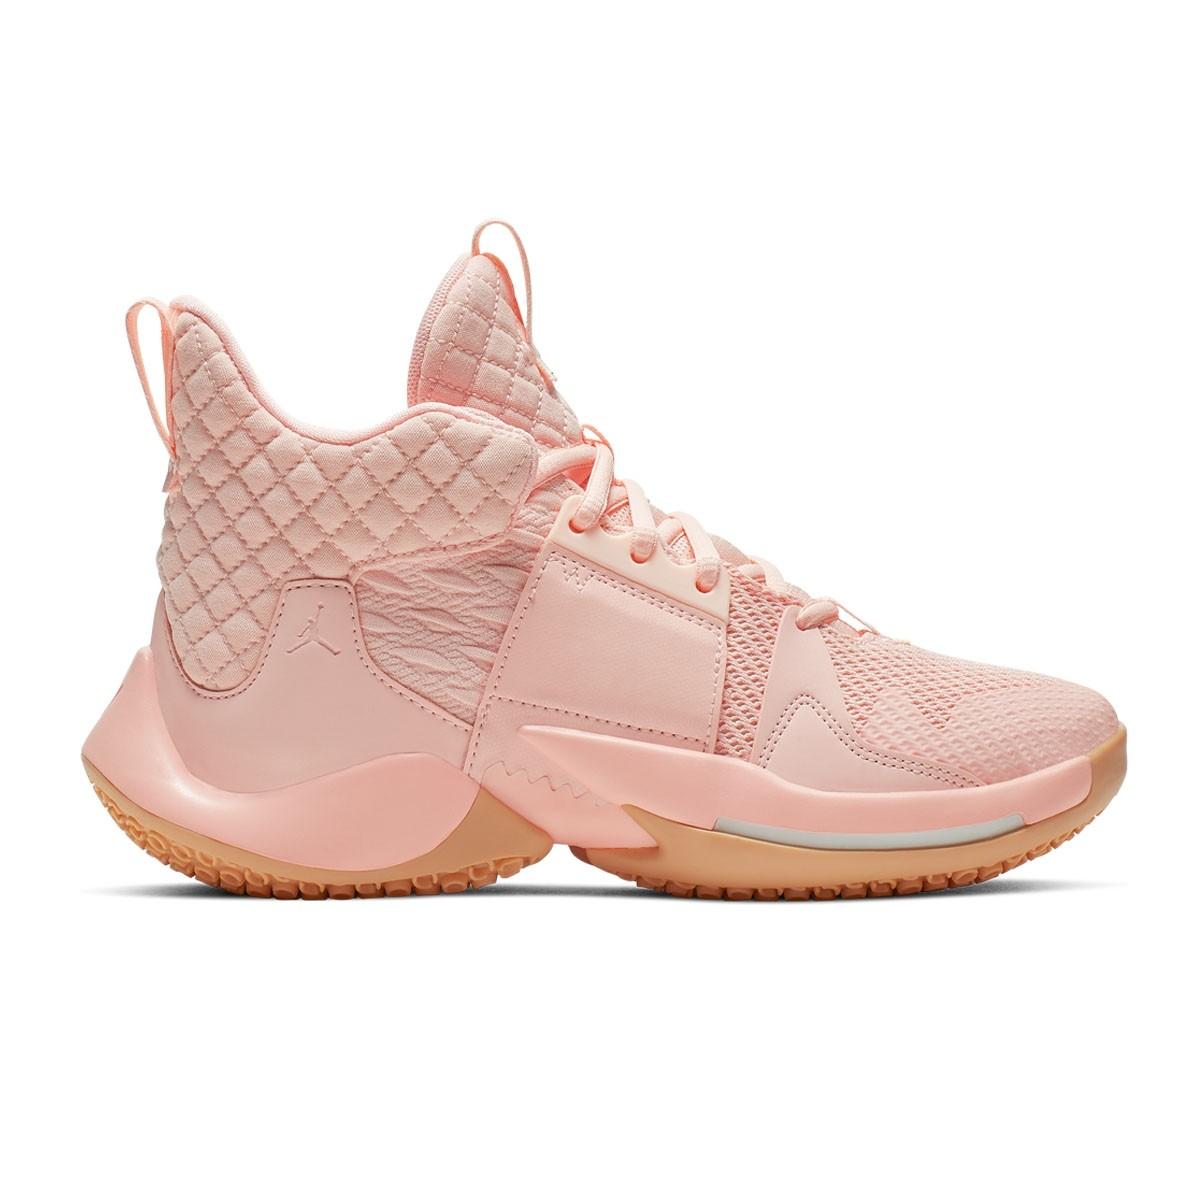 997a84d6 Buy Jordan Why Not Zer0.2 GS 'Cotton Shot' Basketball shoes & sneakers